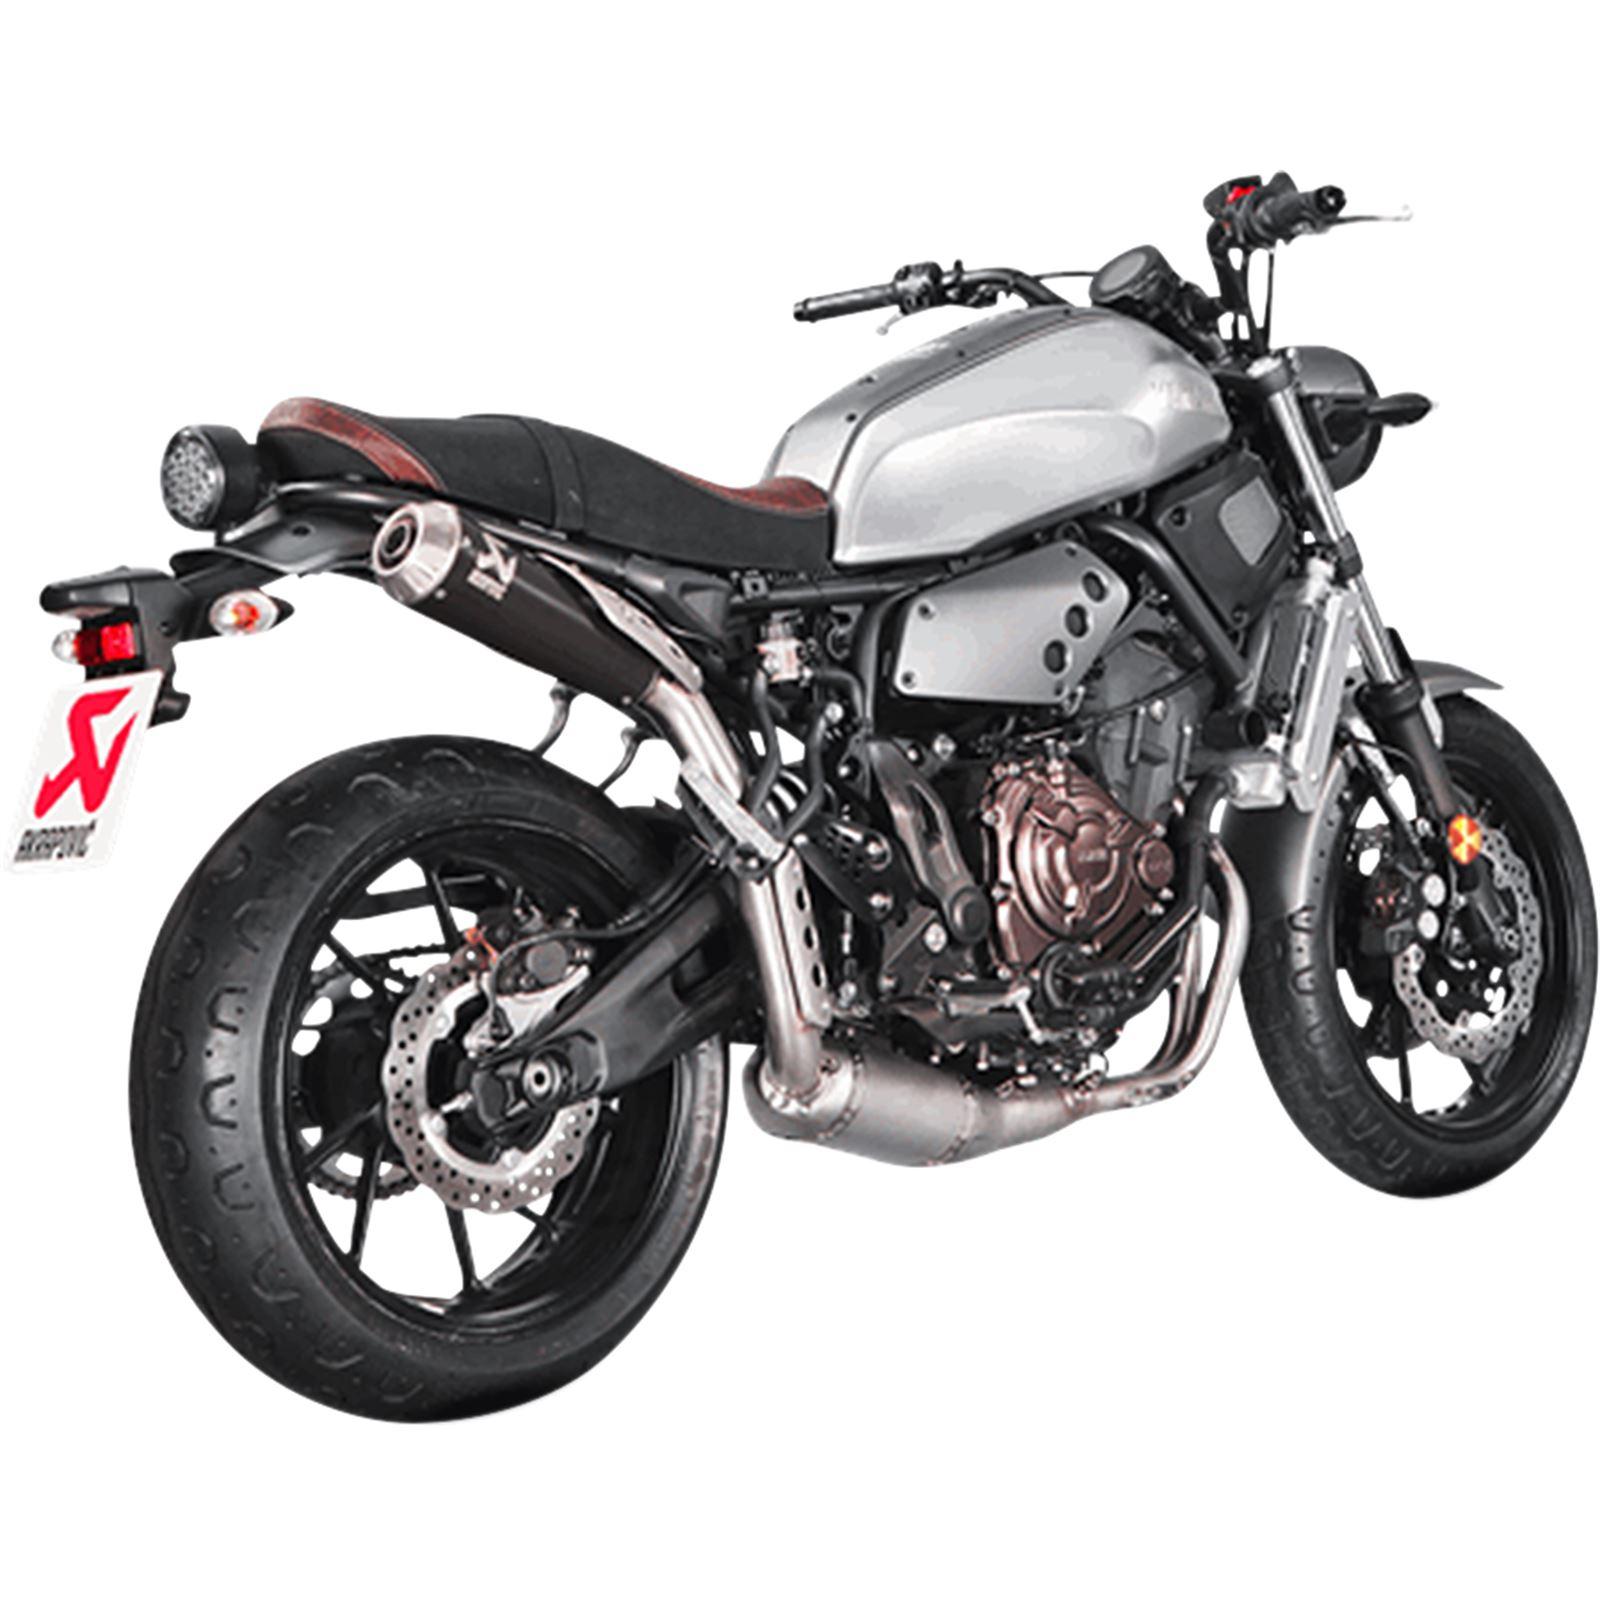 Akrapovic Race Exhaust - Titanium